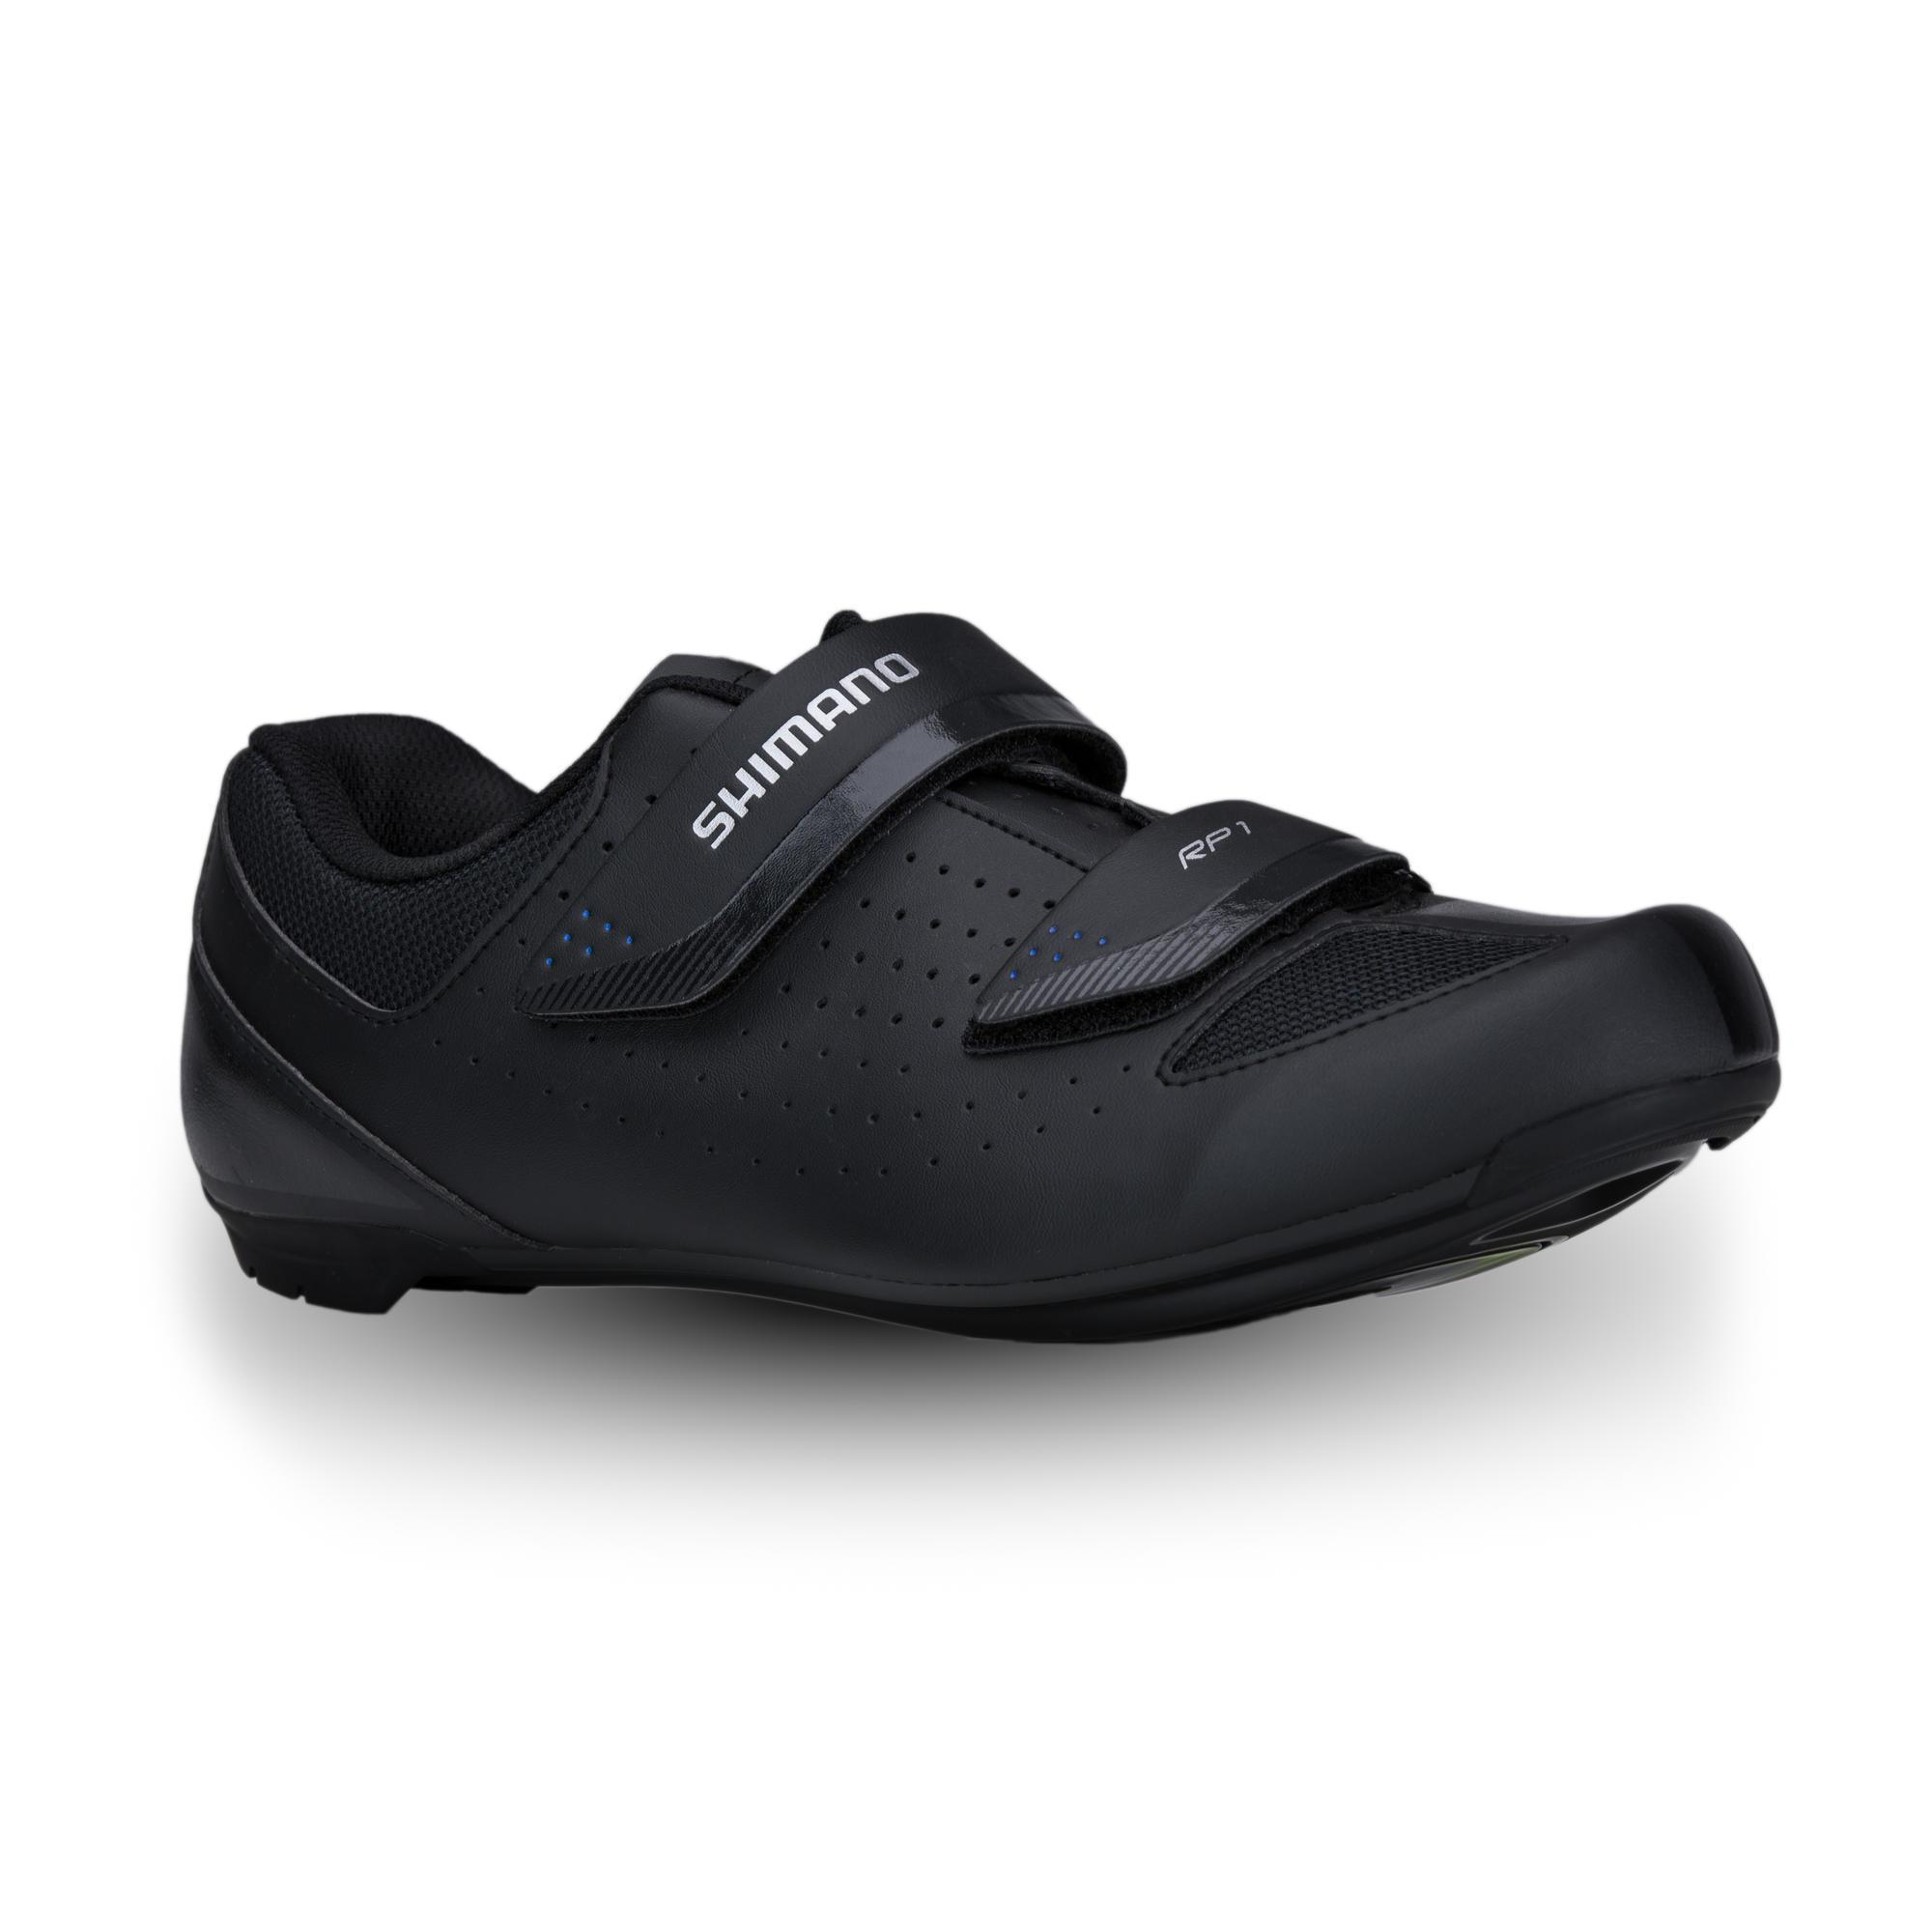 Chaussures vélo SHIMANO RP1 noir - Shimano